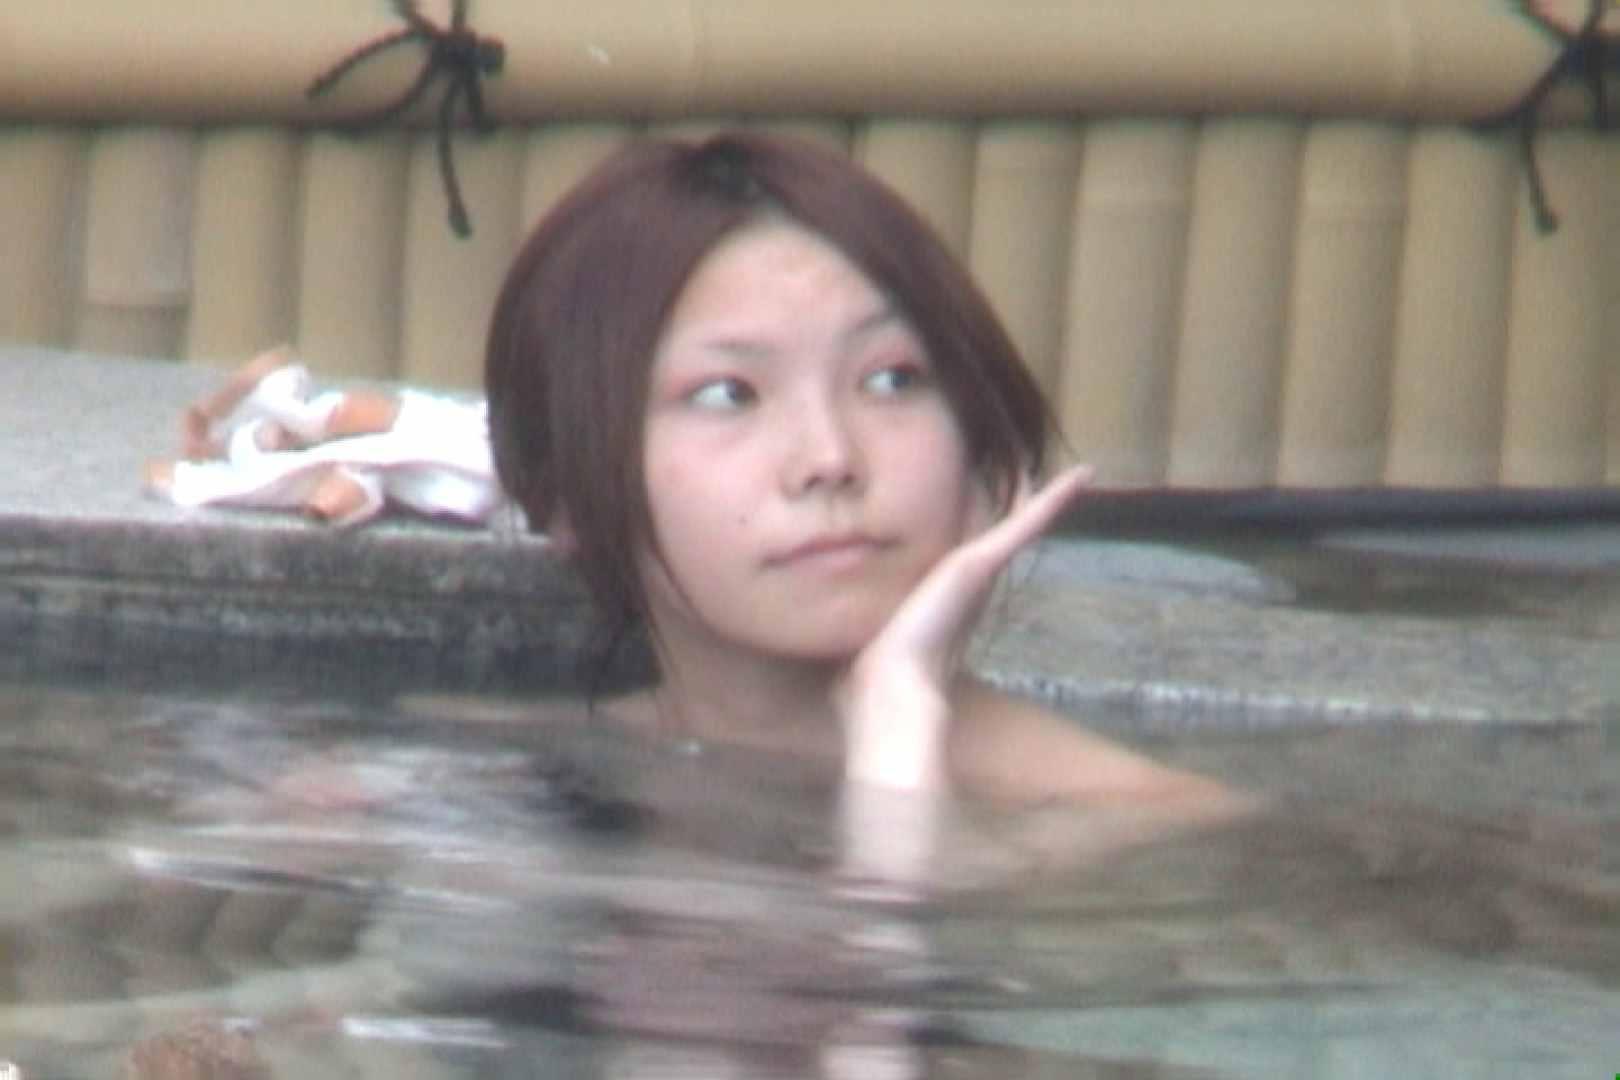 Aquaな露天風呂Vol.570 盗撮 のぞき動画画像 71枚 41